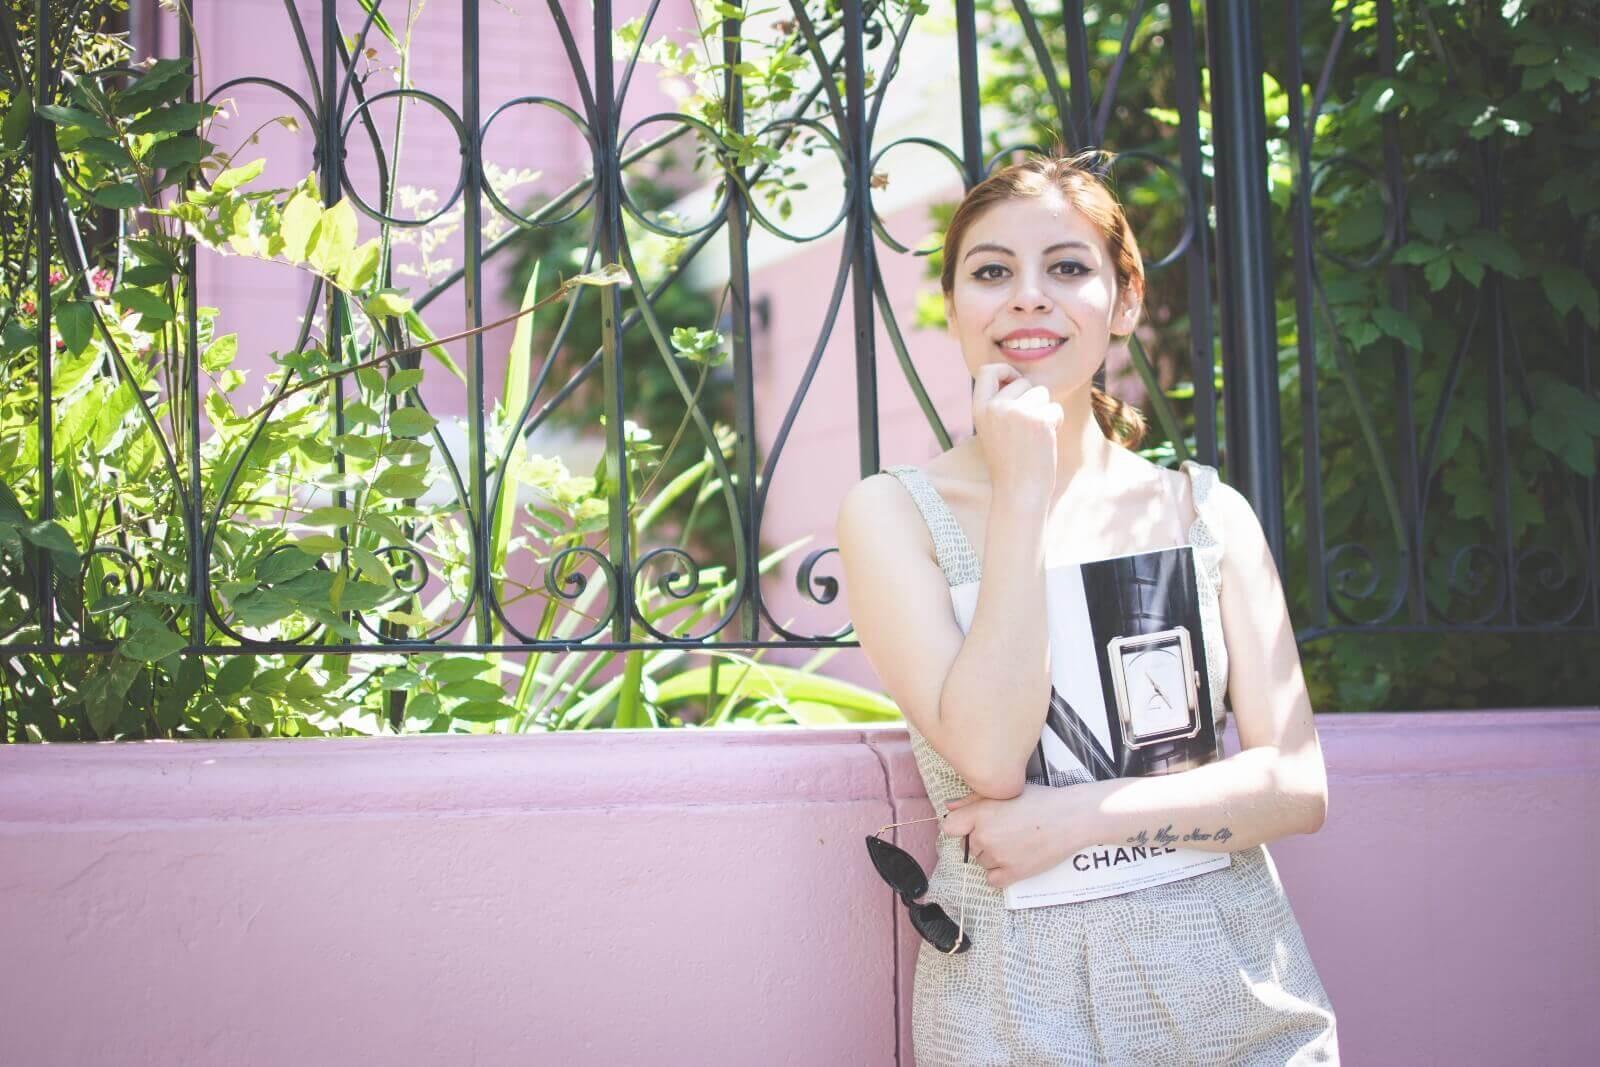 almond-white-dress-sammydress-stilettos-valentino-rockstud-imitation-deborah-ferrero-style-by-deb-ladylike10